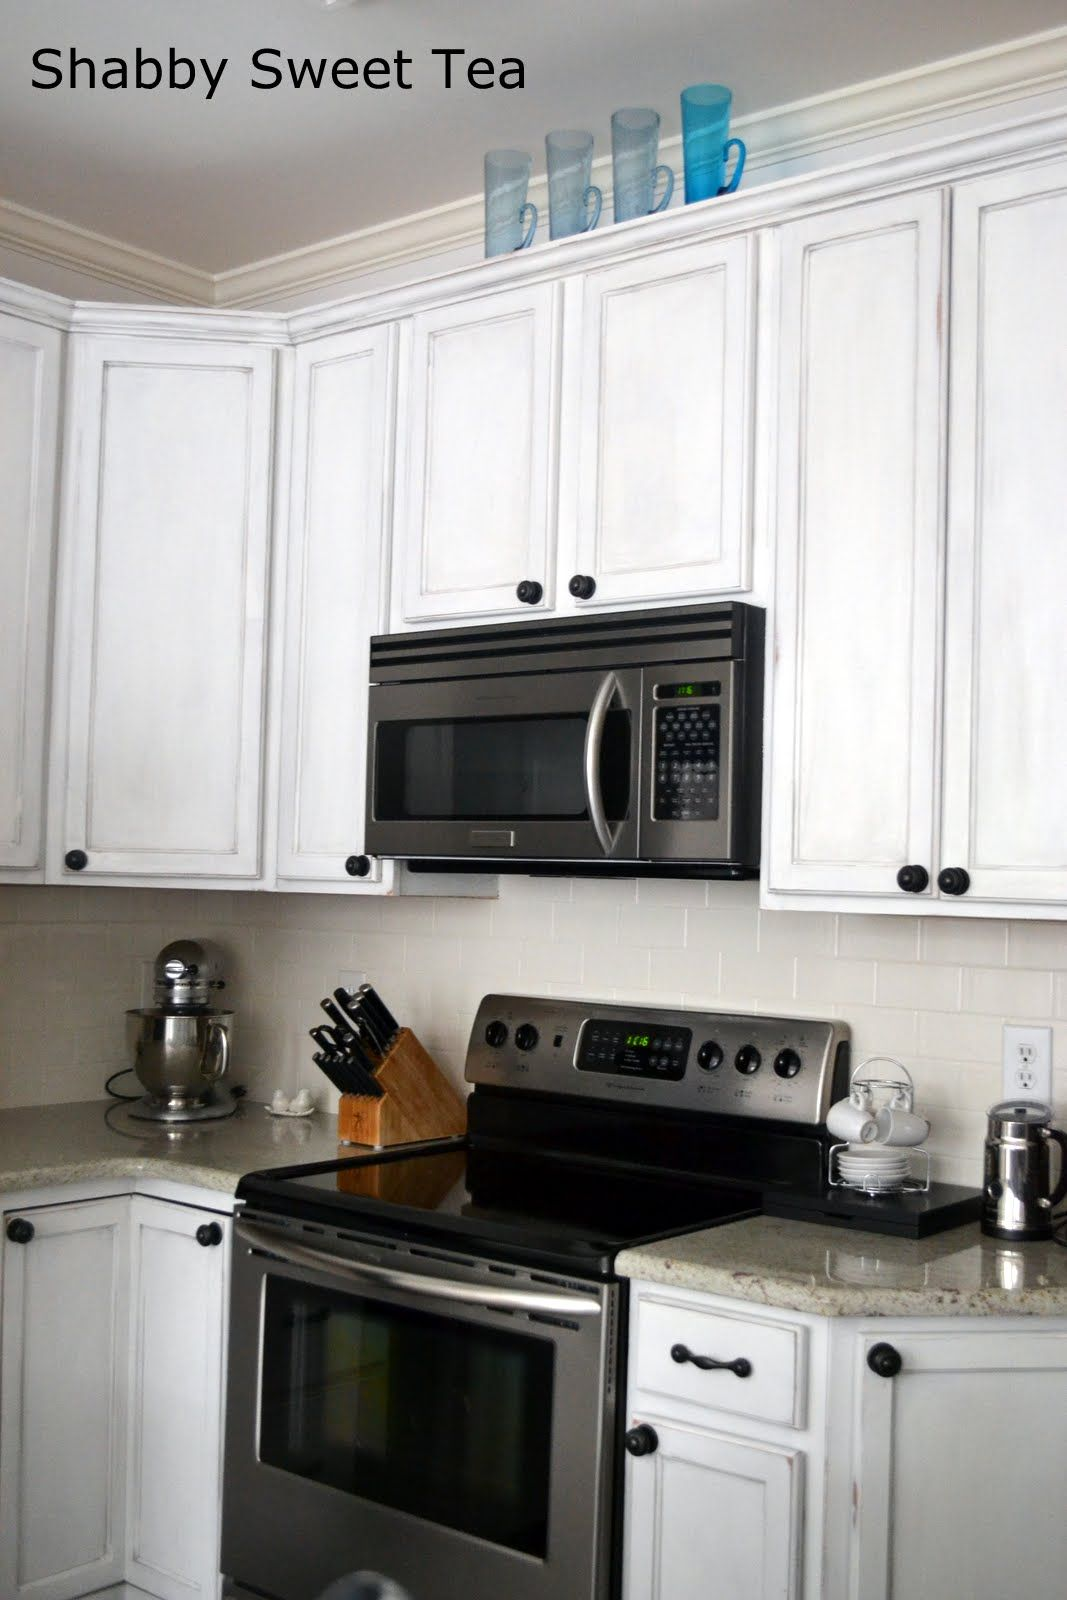 Shabby sweet tea annie sloan chalk paint kitchen cabinets love the